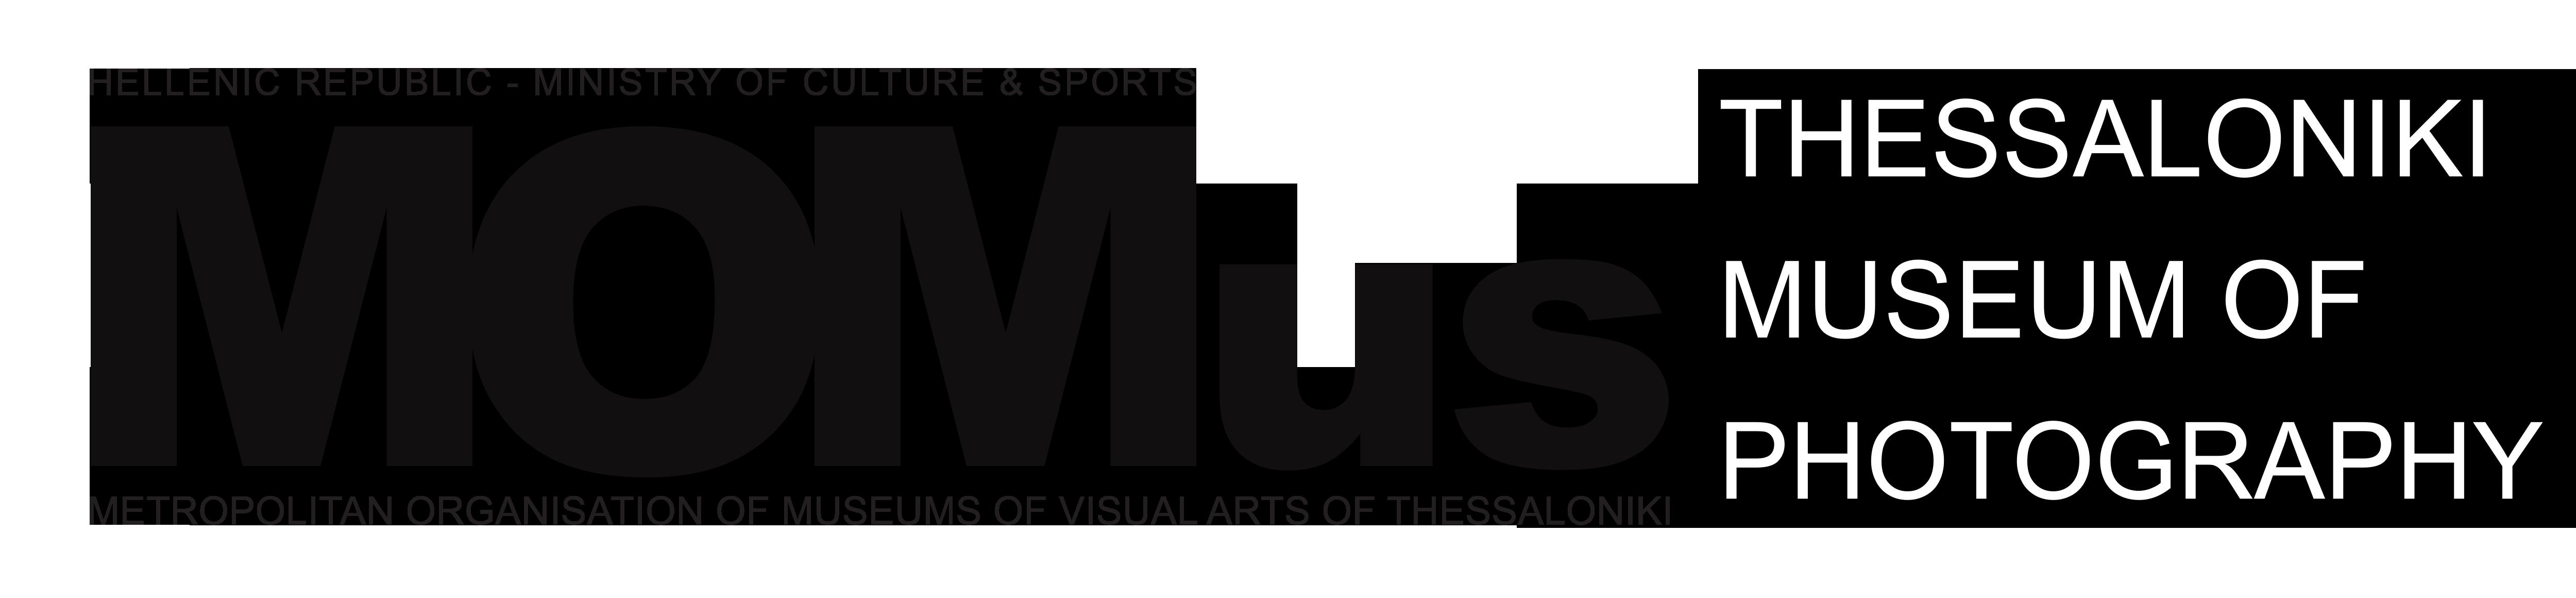 MOMus-Thessaloniki Museum of Photography